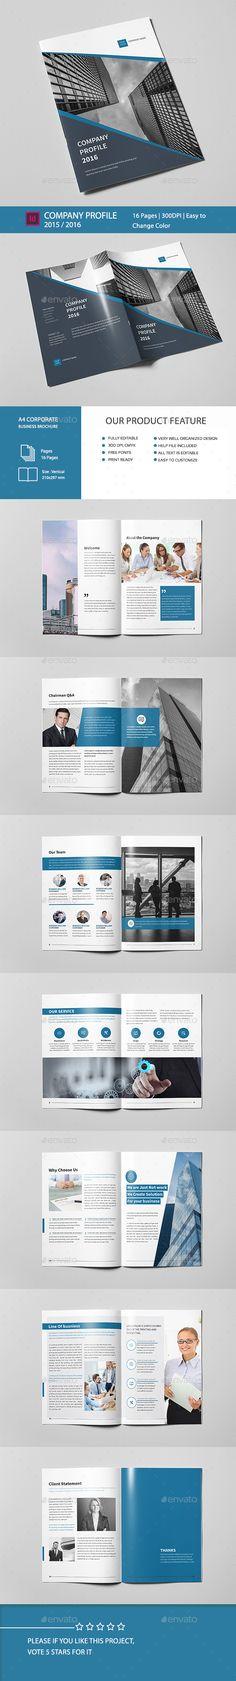 Kreatype Company Profile  Company Profile Templates And